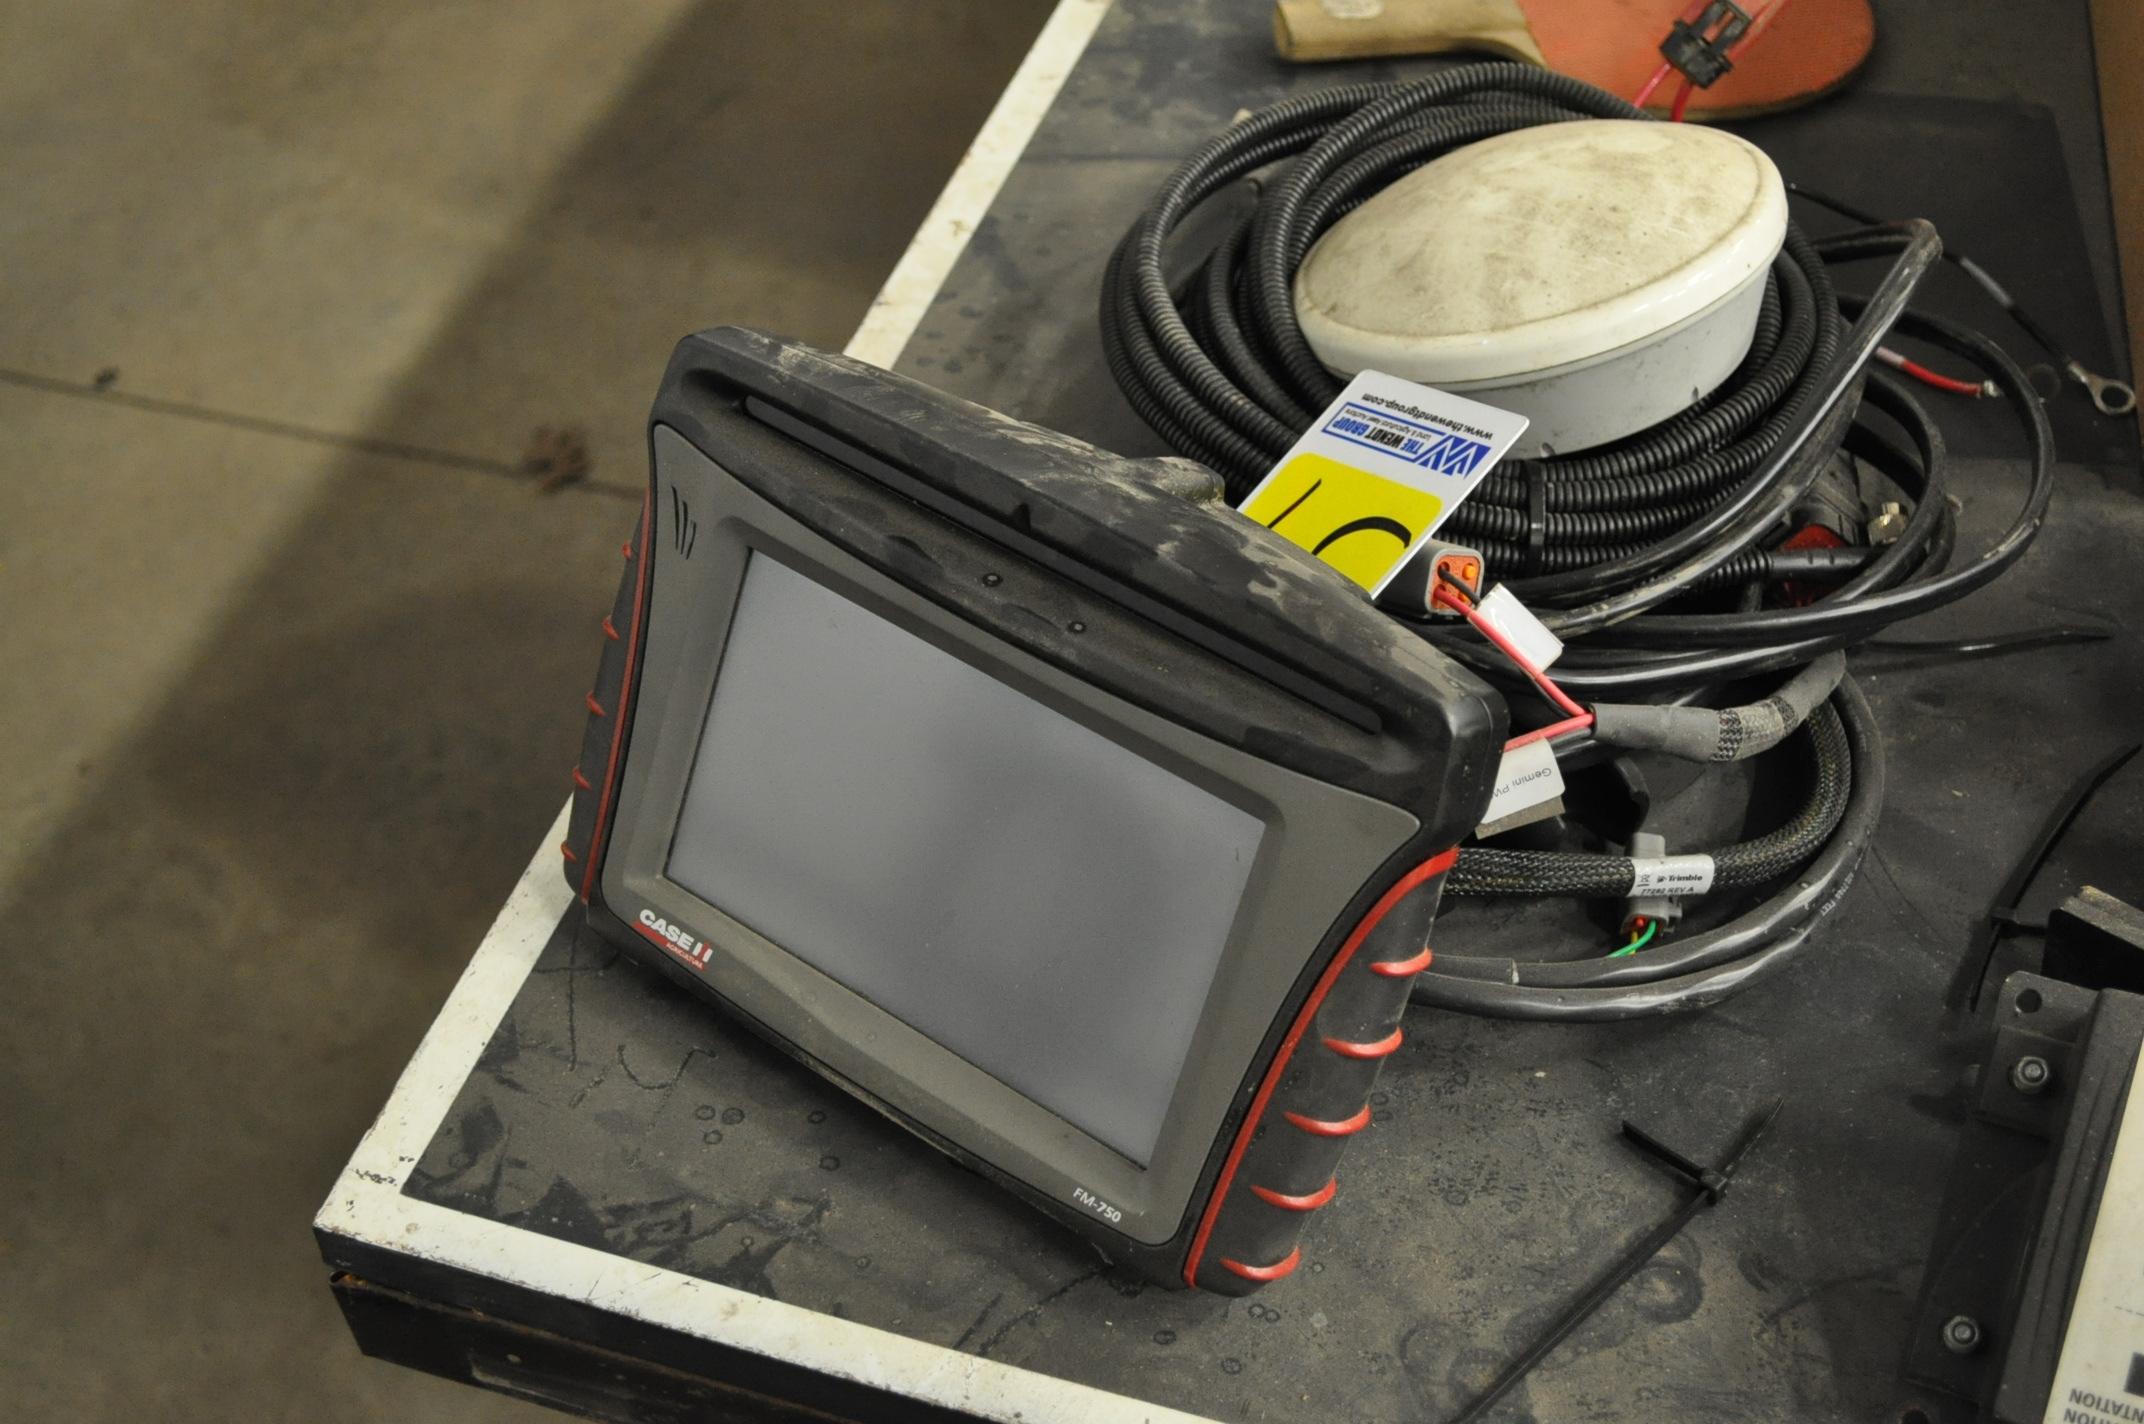 Case IH FM-750 GPS receiver, AG-25 antenna, RangePoint RTX, SN 5839571782